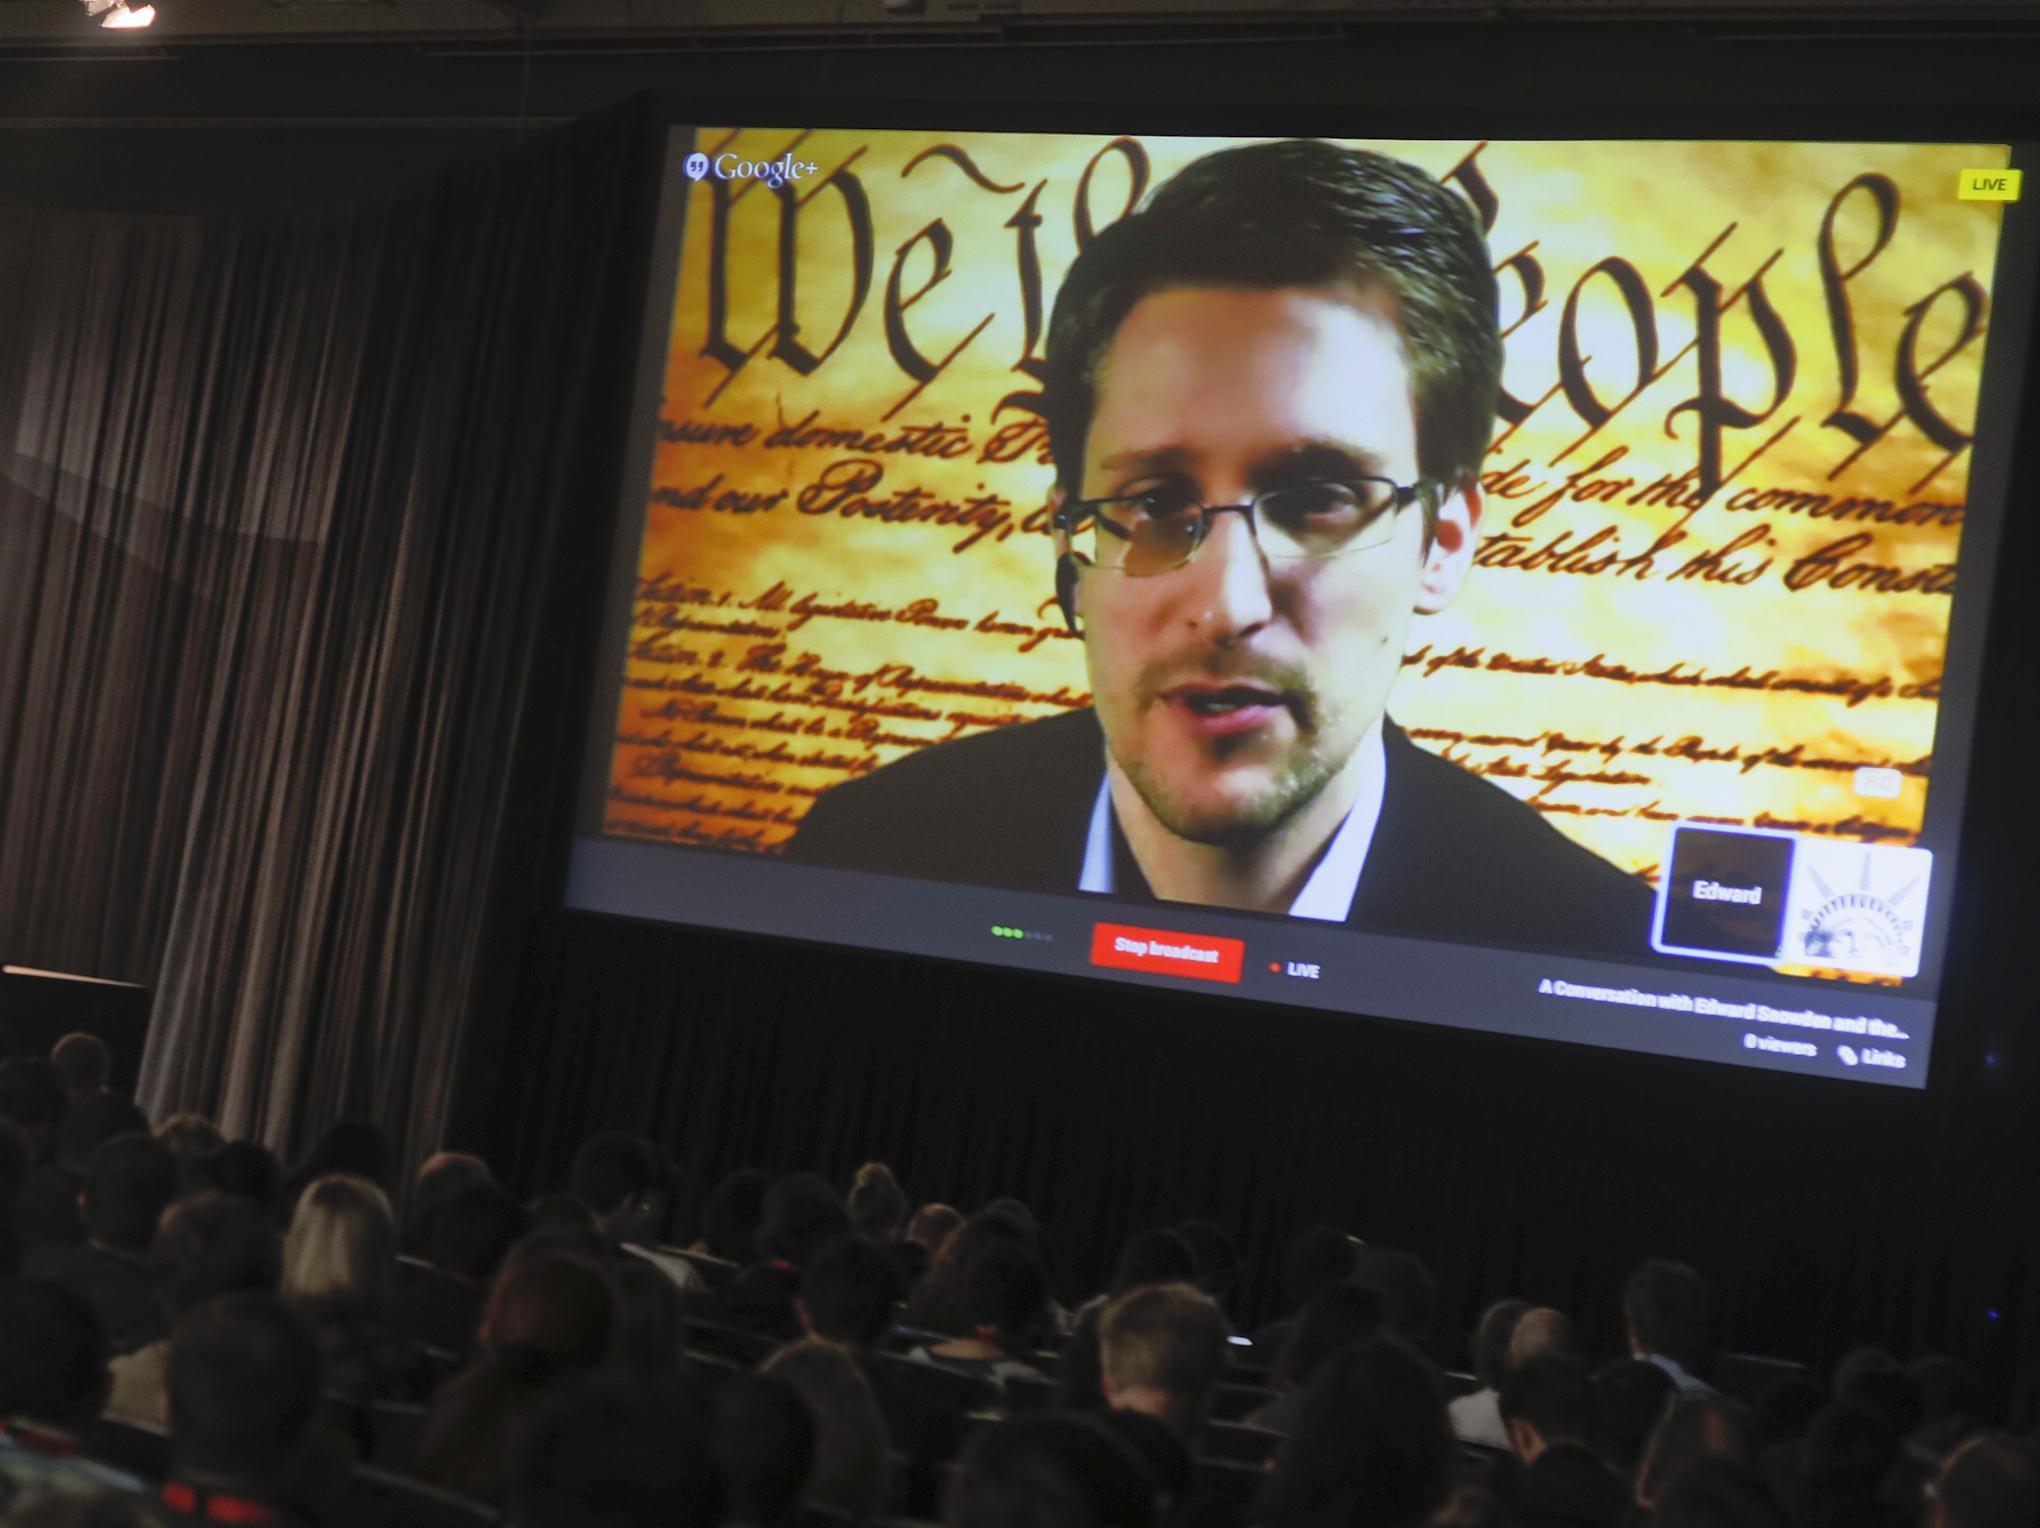 the case of michael g winston a company whistleblower